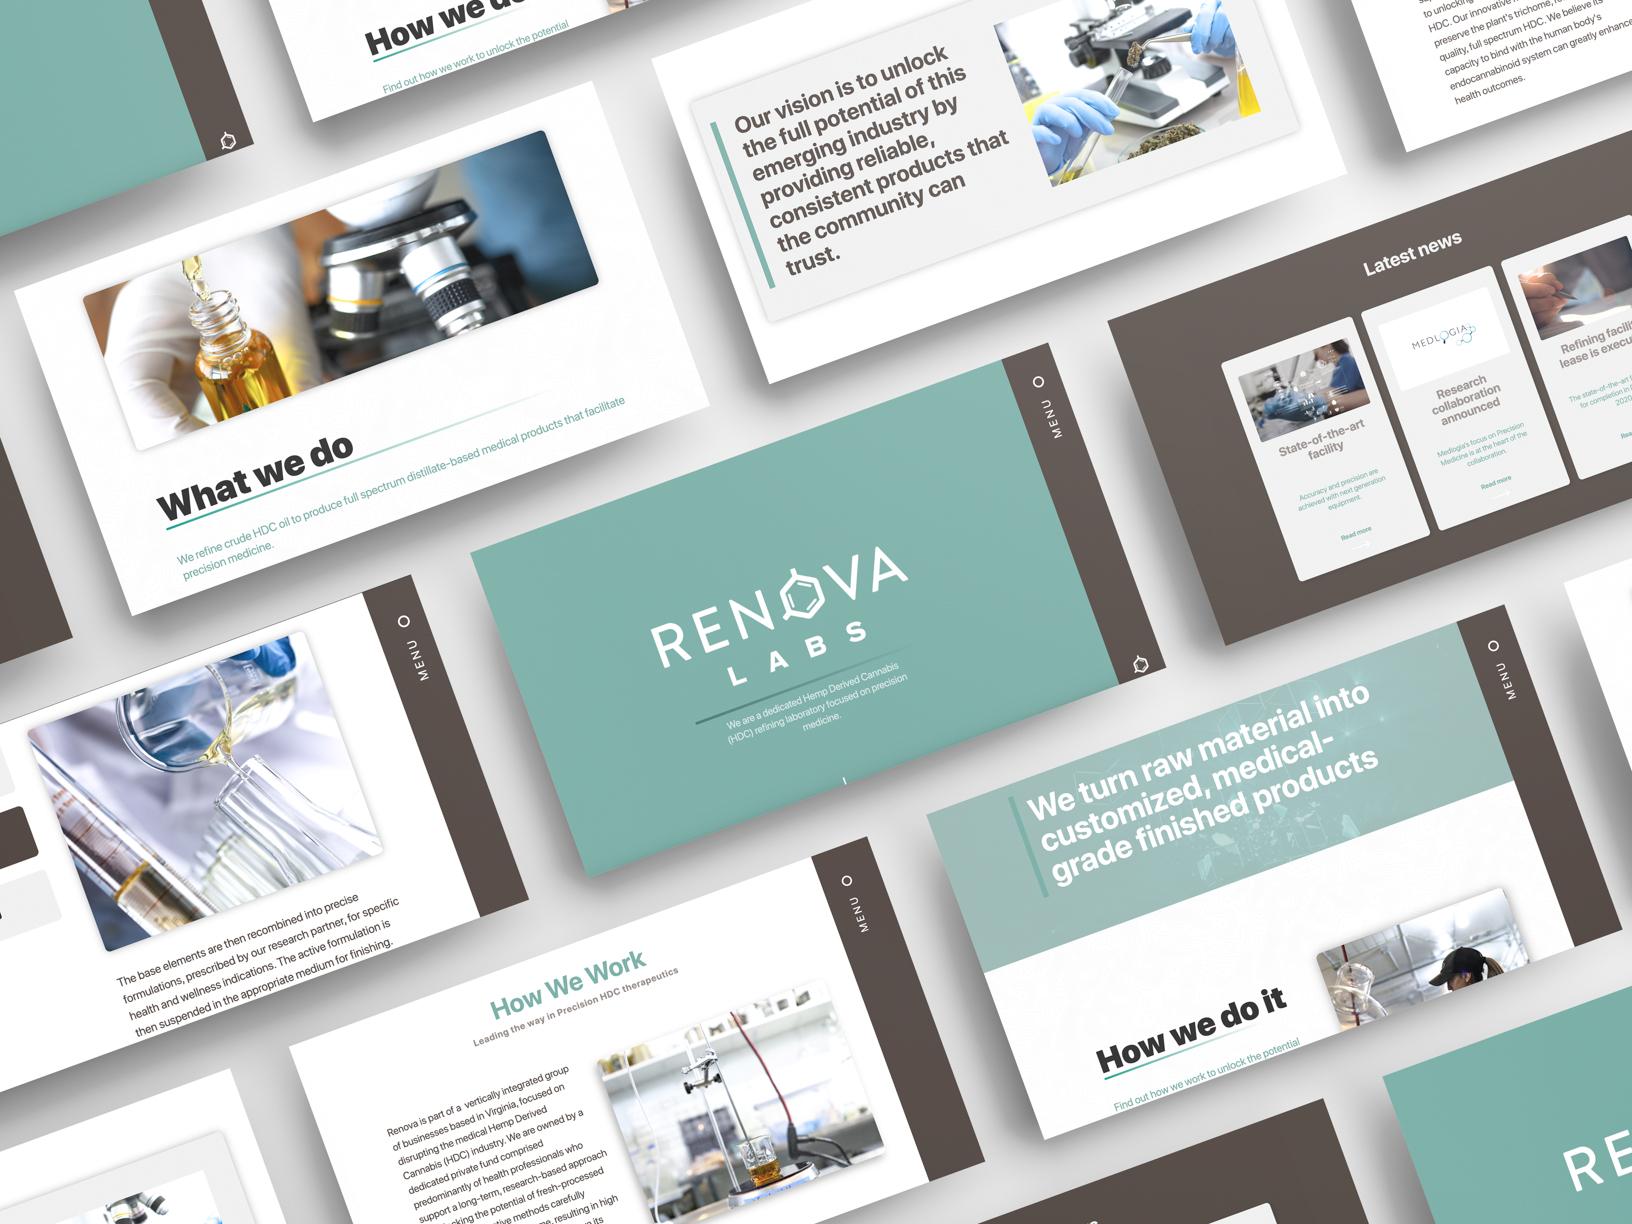 Renova Labs